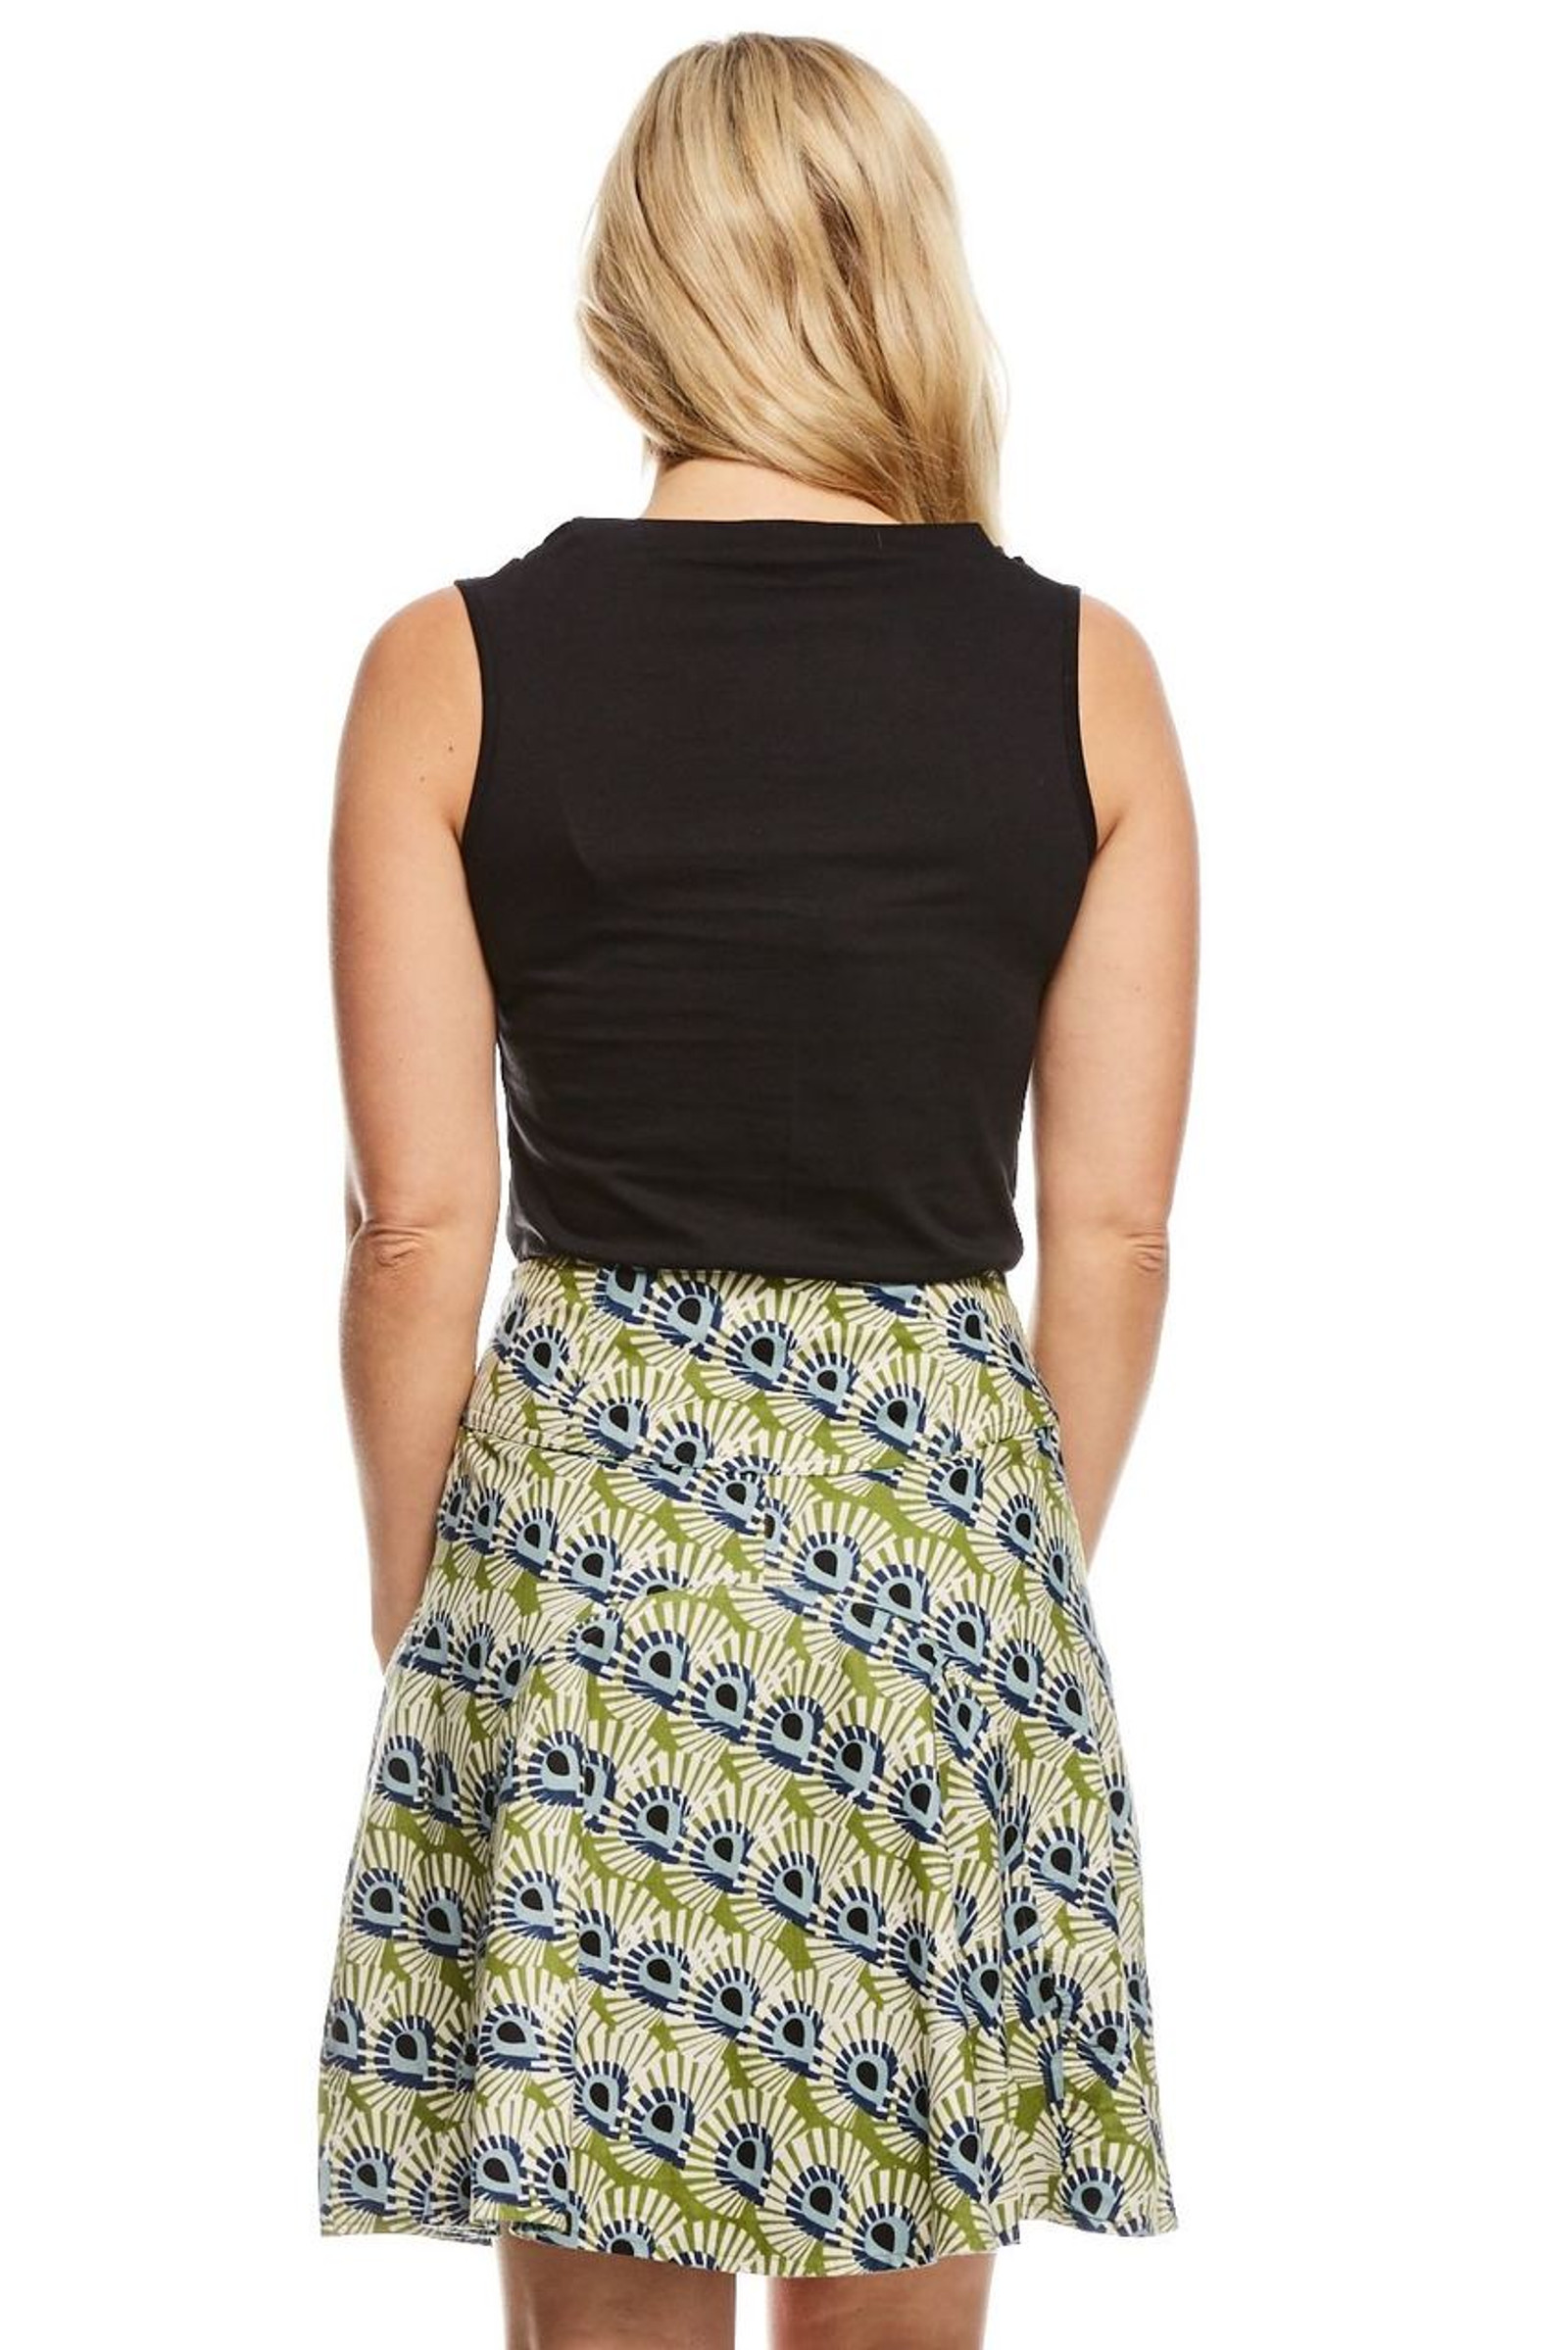 Reversible Skirt - Mystic & Tic Tac Blue